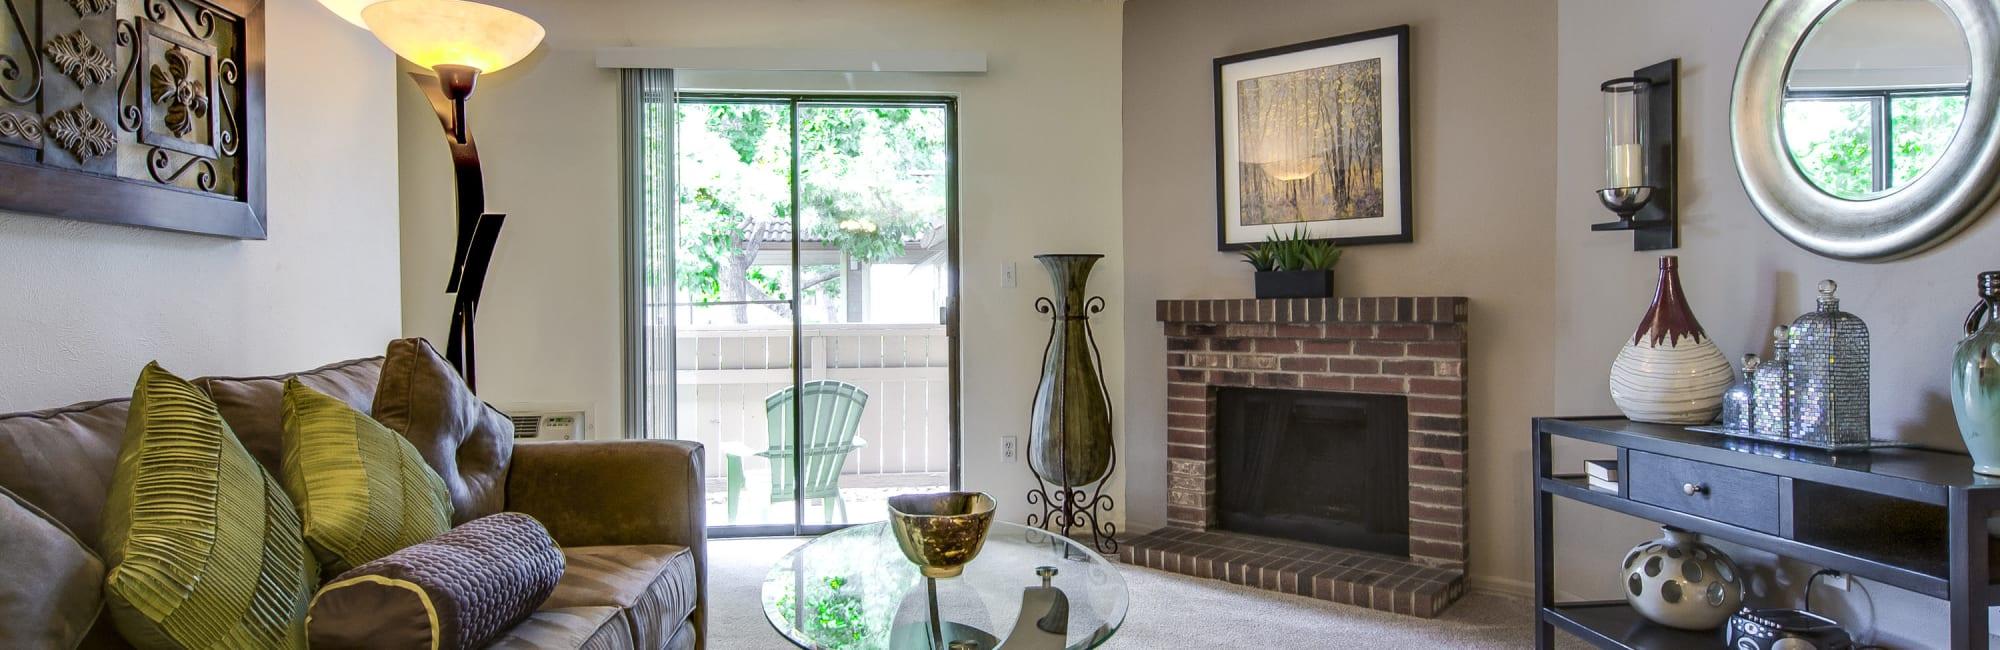 Apartments at Santana Ridge in Denver, Colorado